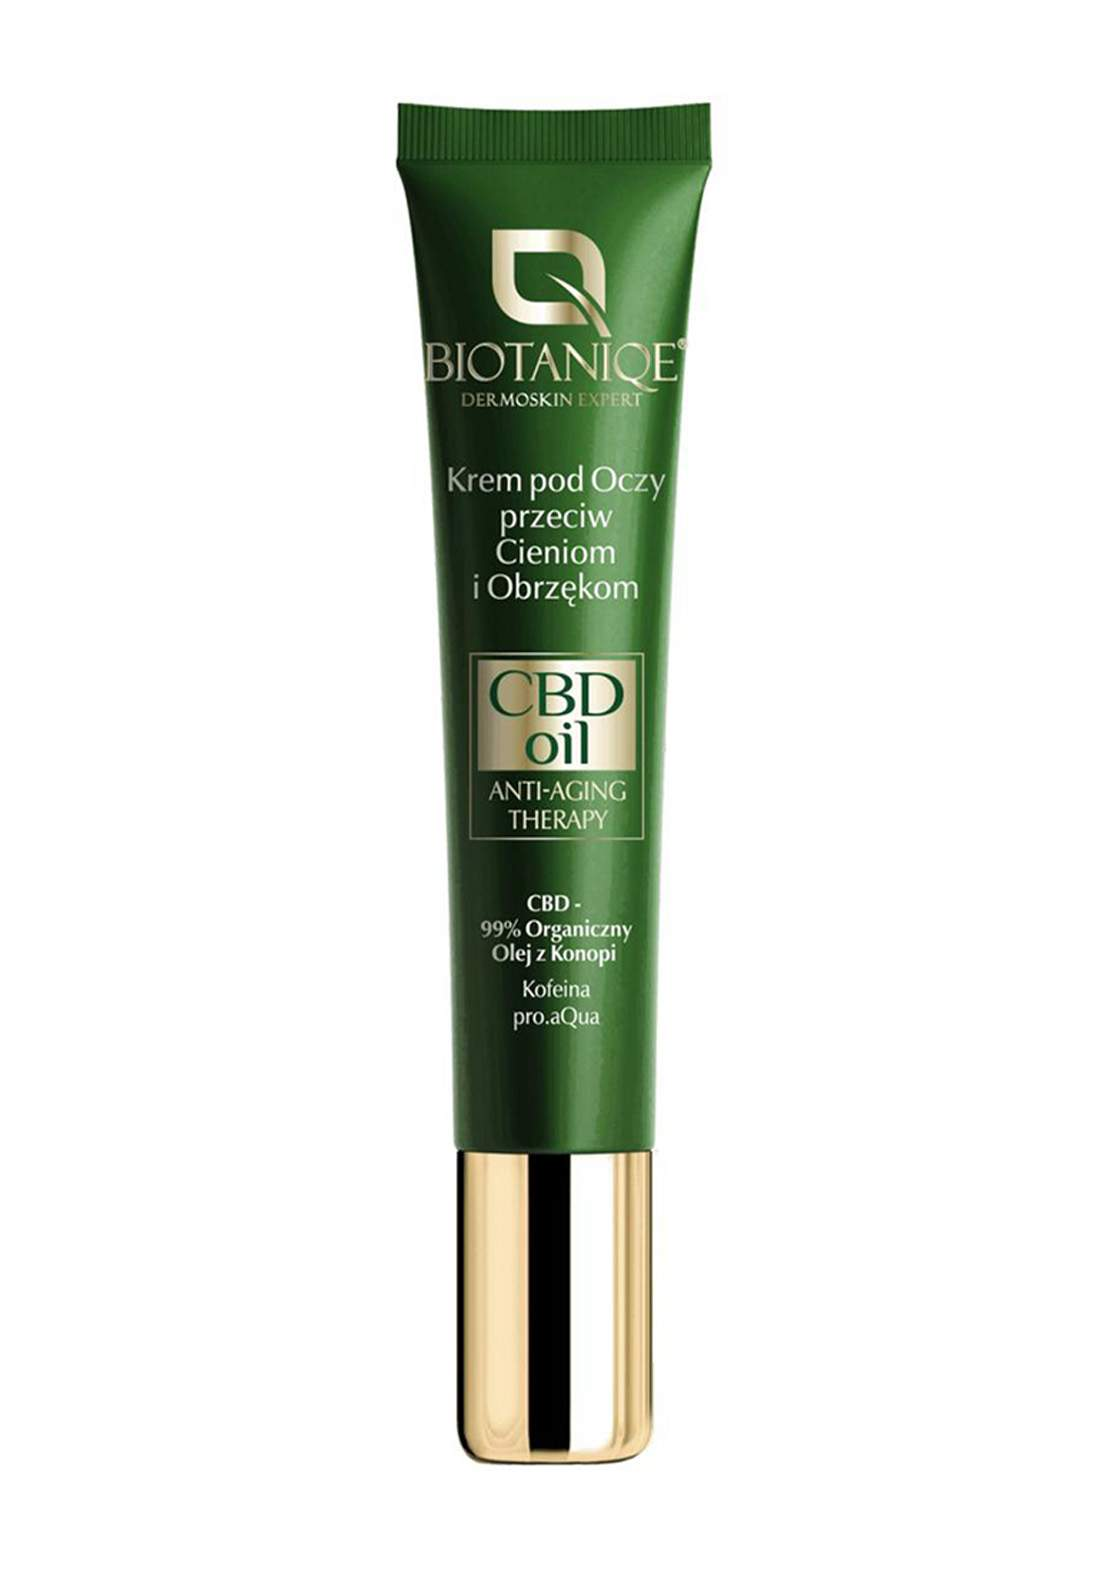 Biotaniqe CBD Oil Anti-Aging Eye Cream 15ml كريم معالج لمنطقة حول العين